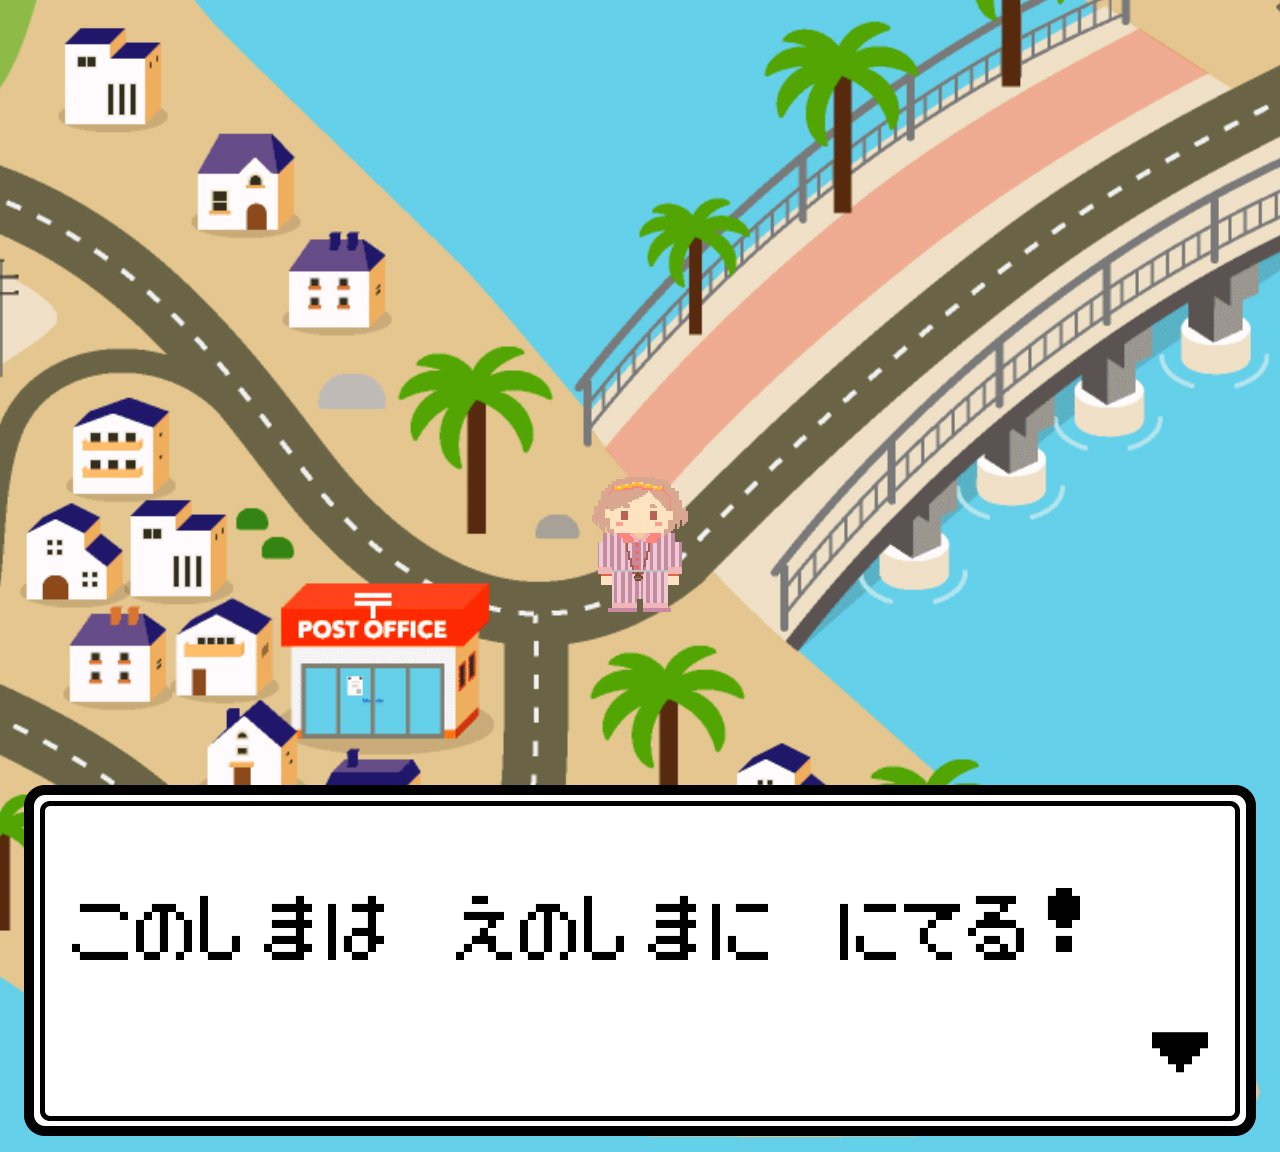 P.A.LANDプロモーション動画キャプチャ 江ノ島